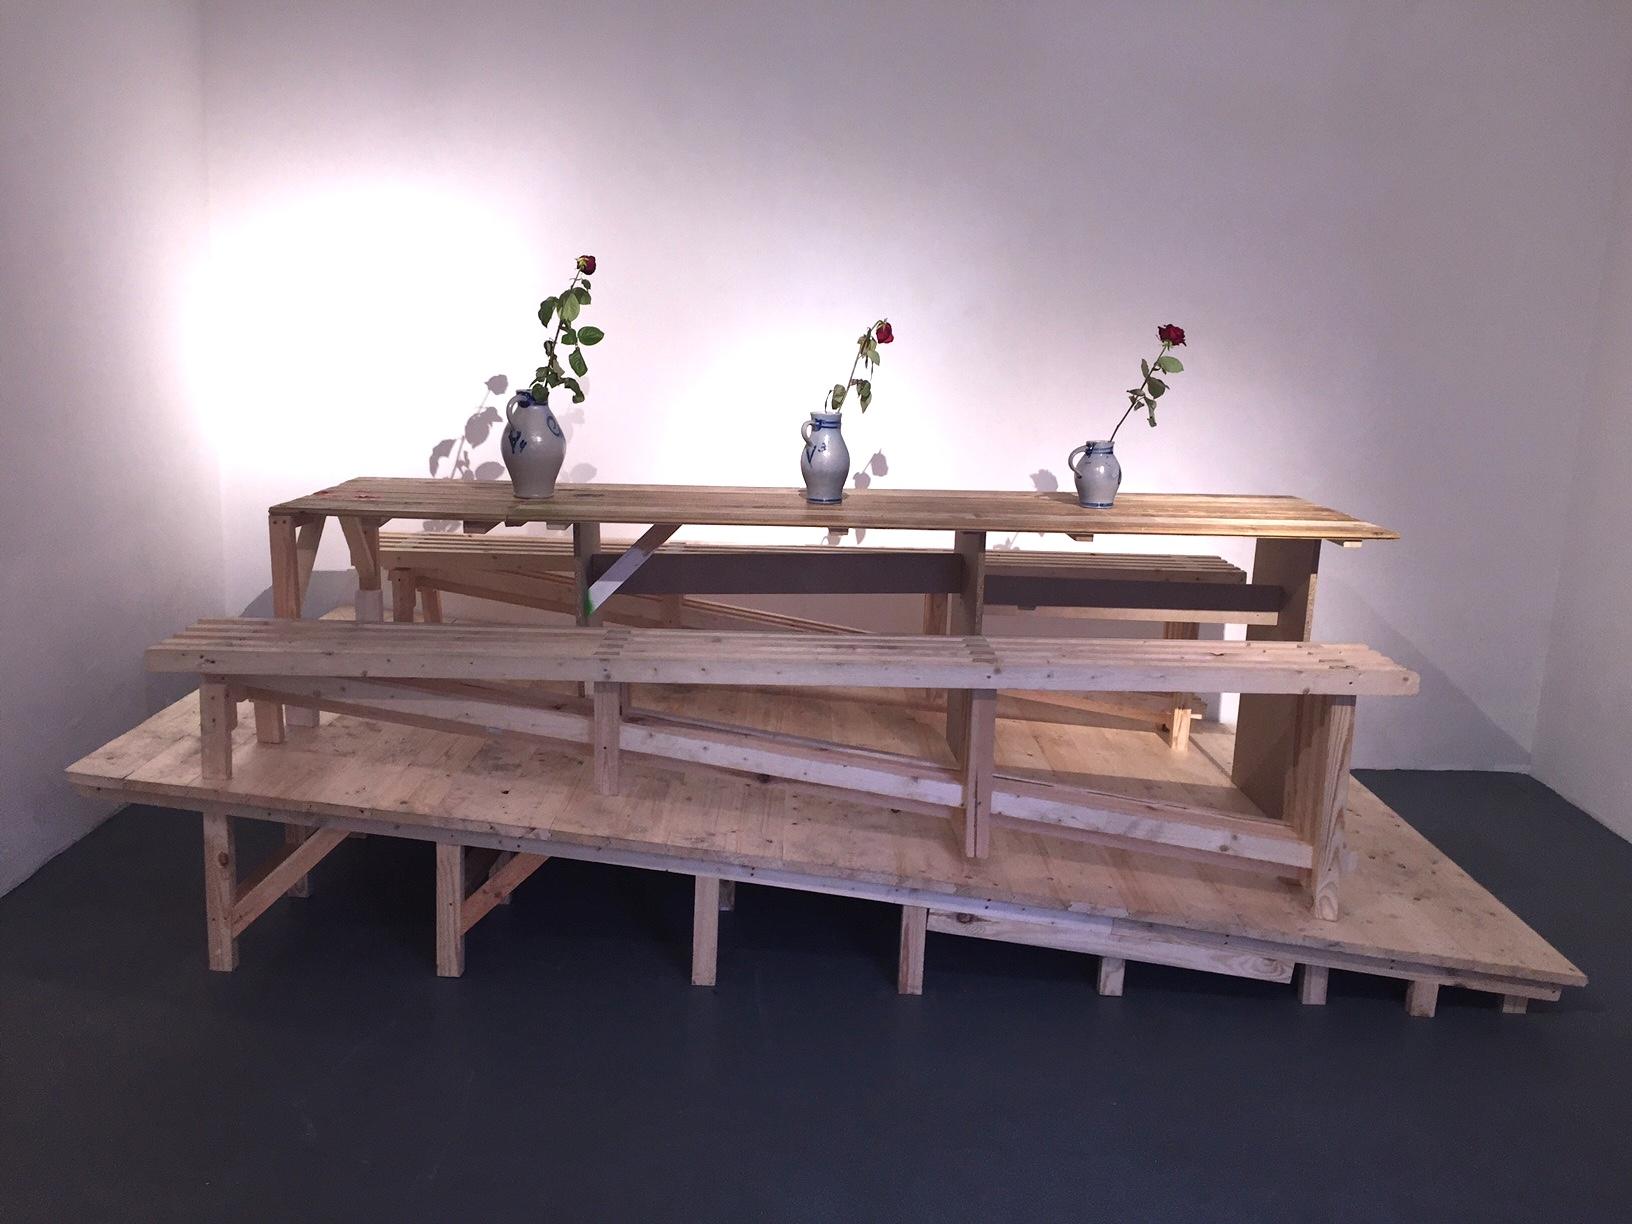 Timo Klöppel, Das experiment mit den 12, 365 x 200 x 110 cm, 2016